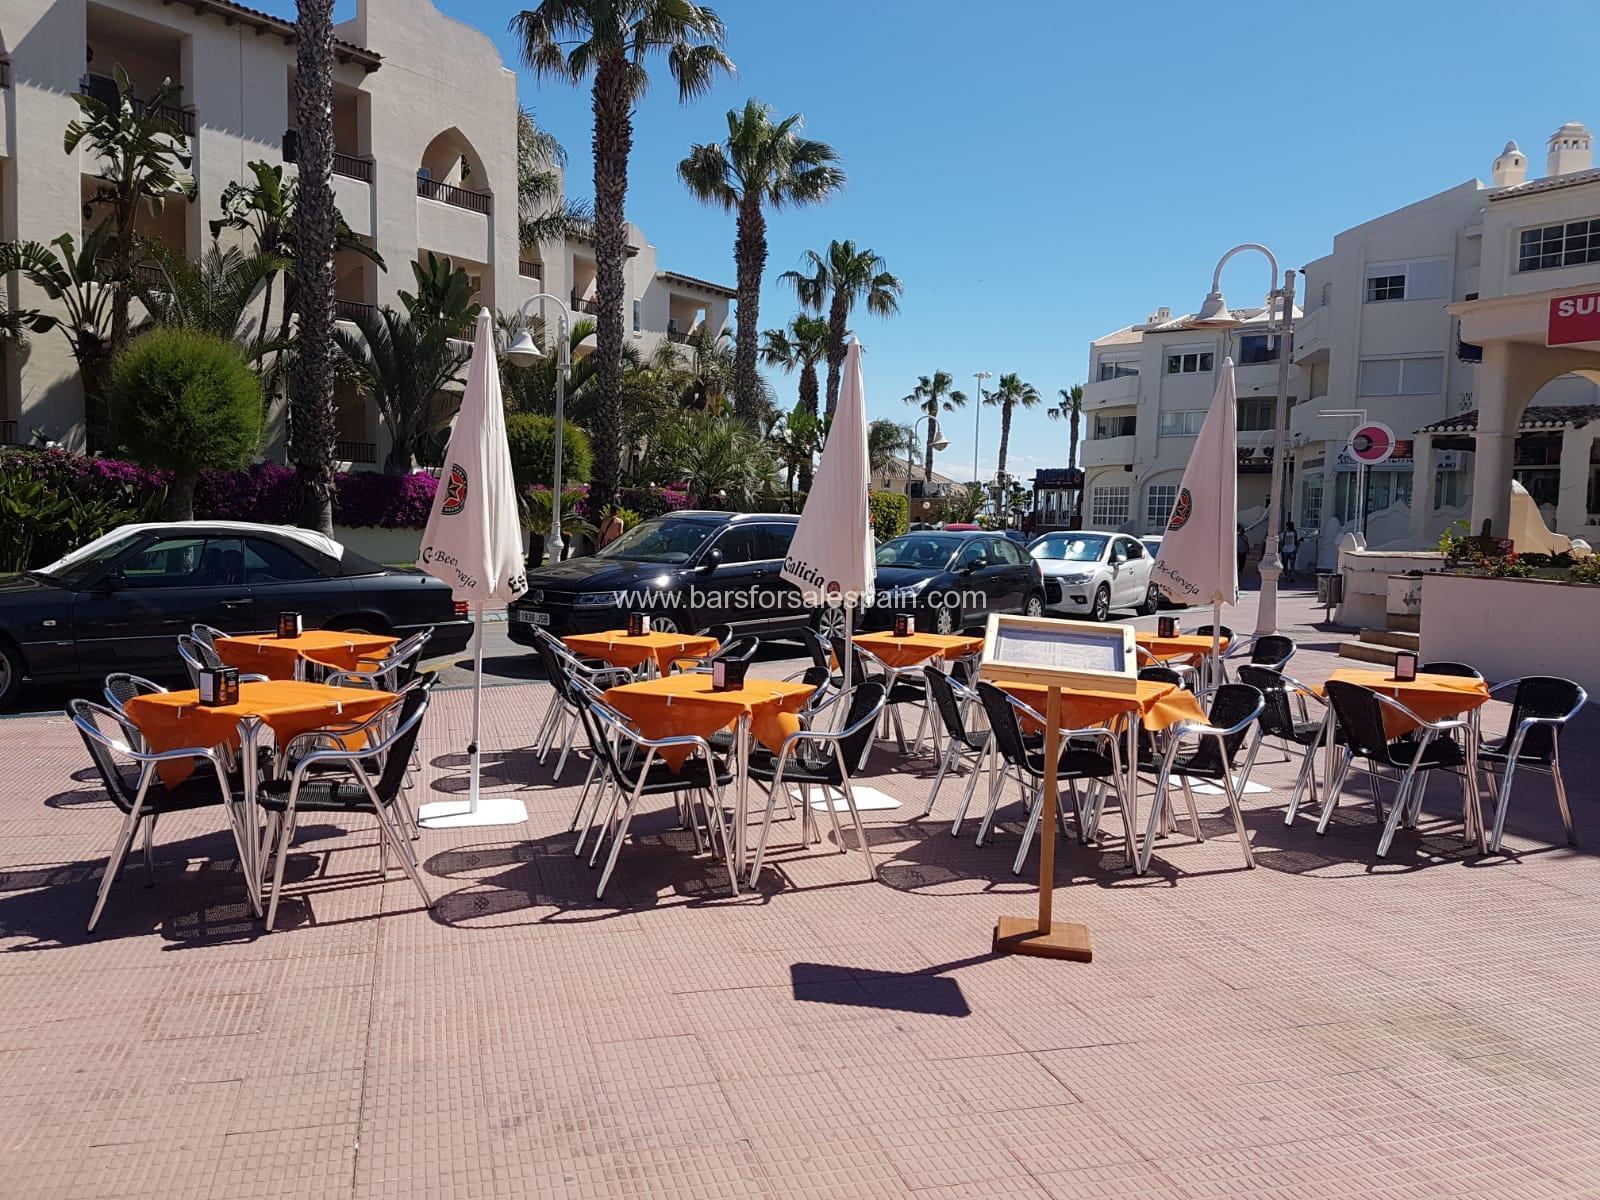 Fantastic Cafe Bar in Benalmadena Costa, Malaga, Spain